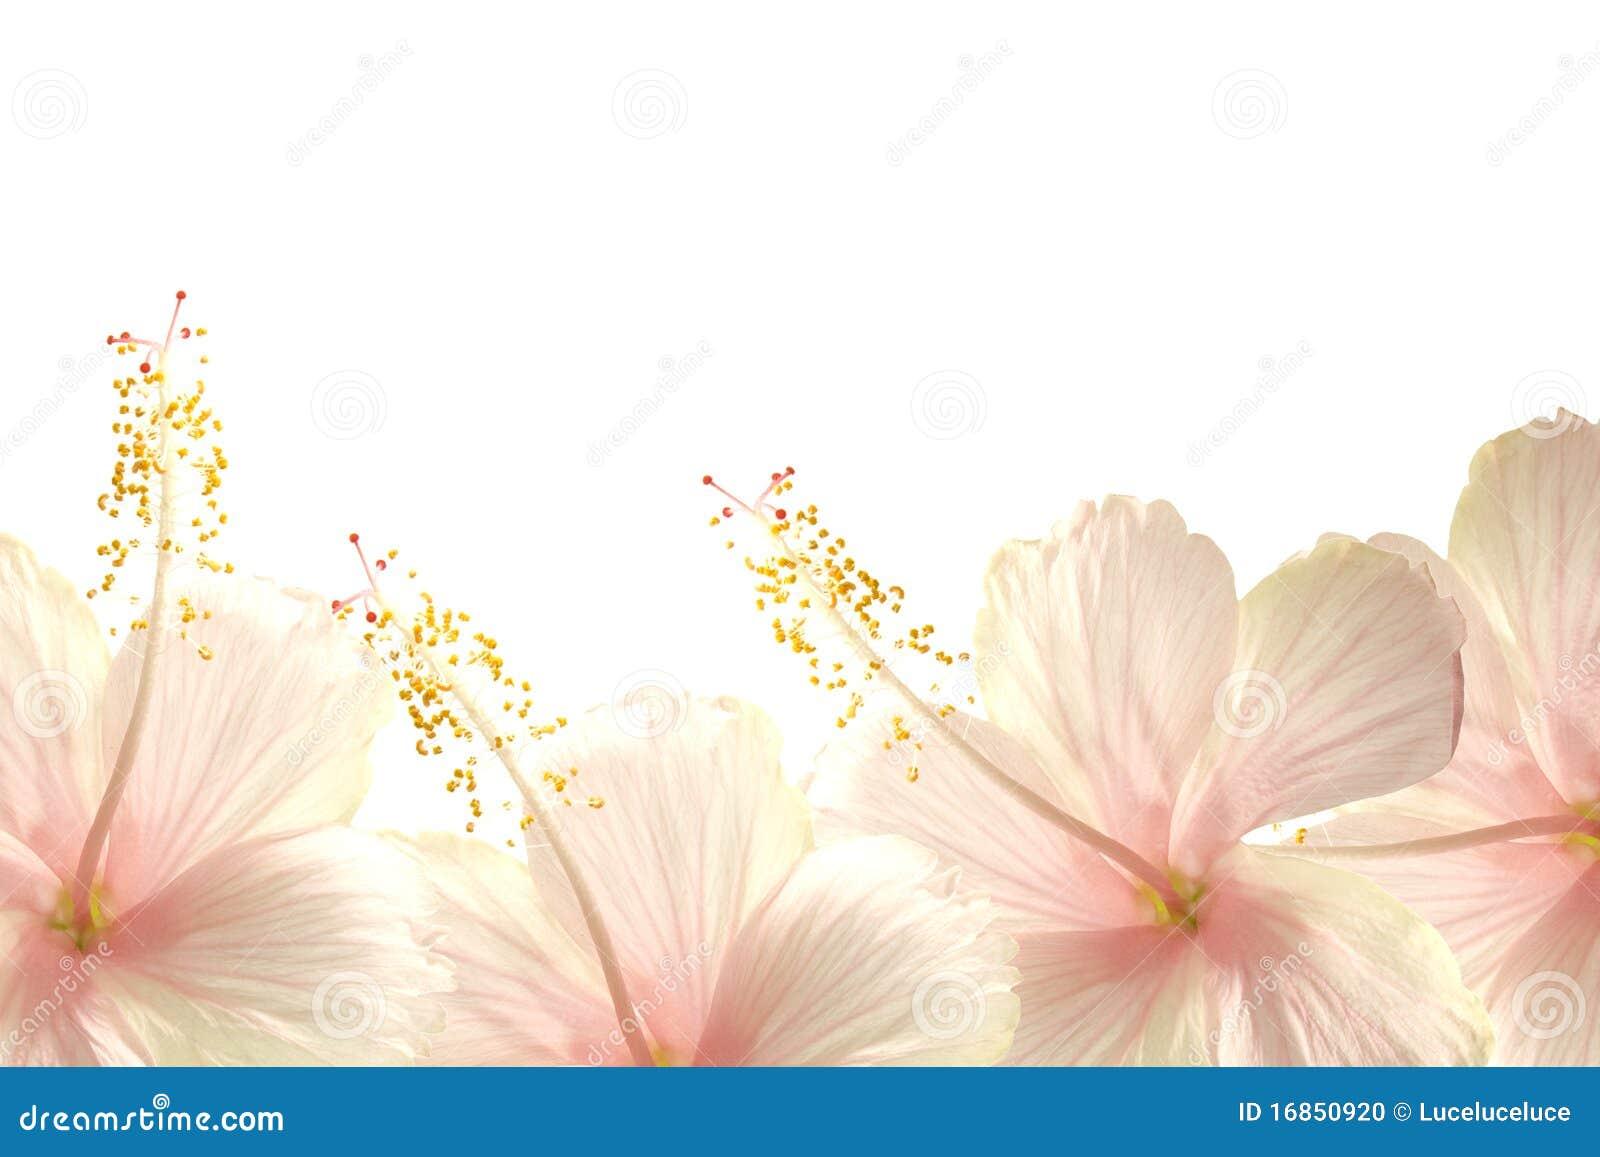 Sunlight pink hibiscus flower border background